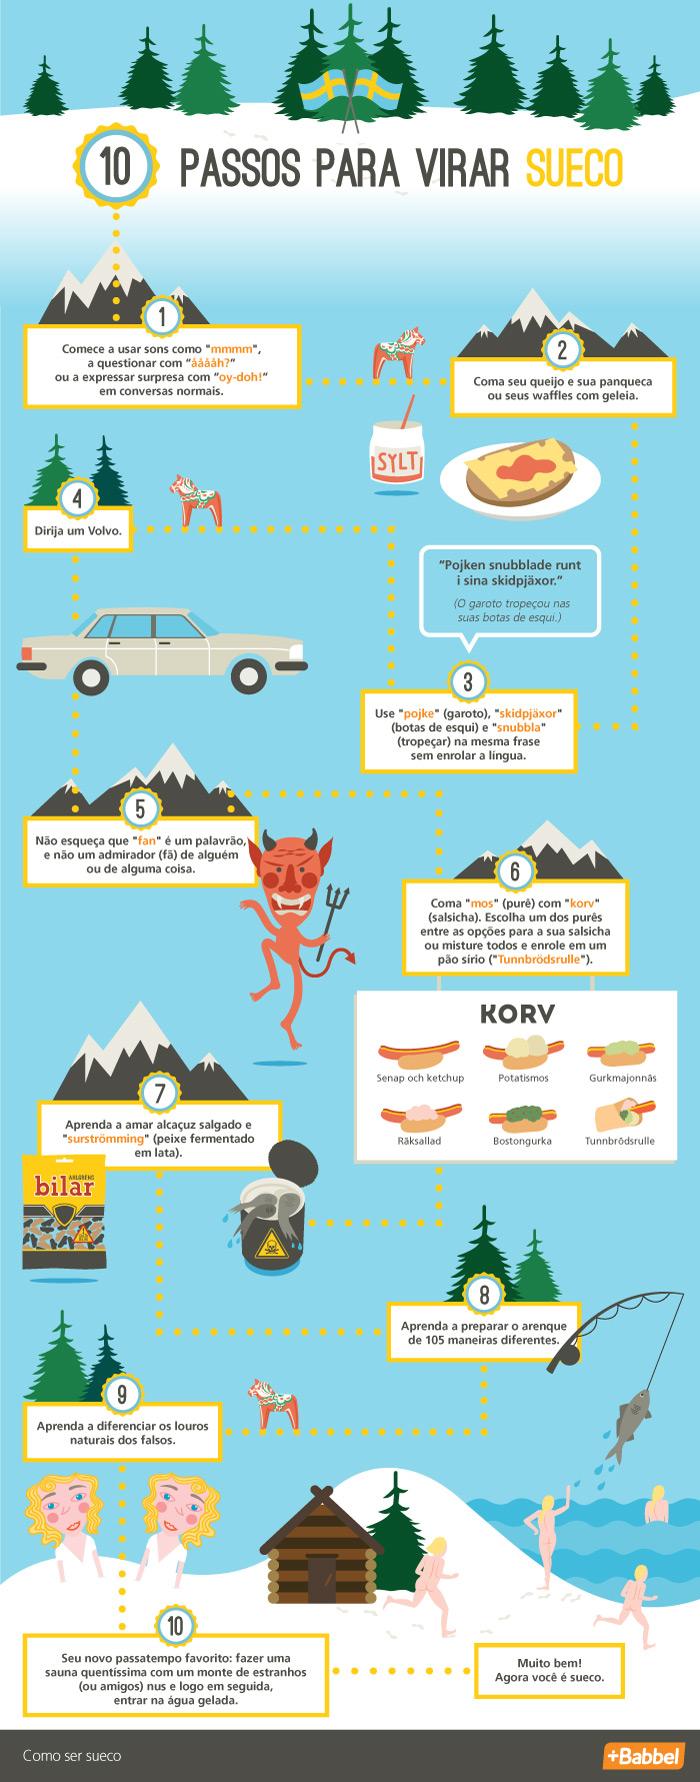 10 passos para virar sueco